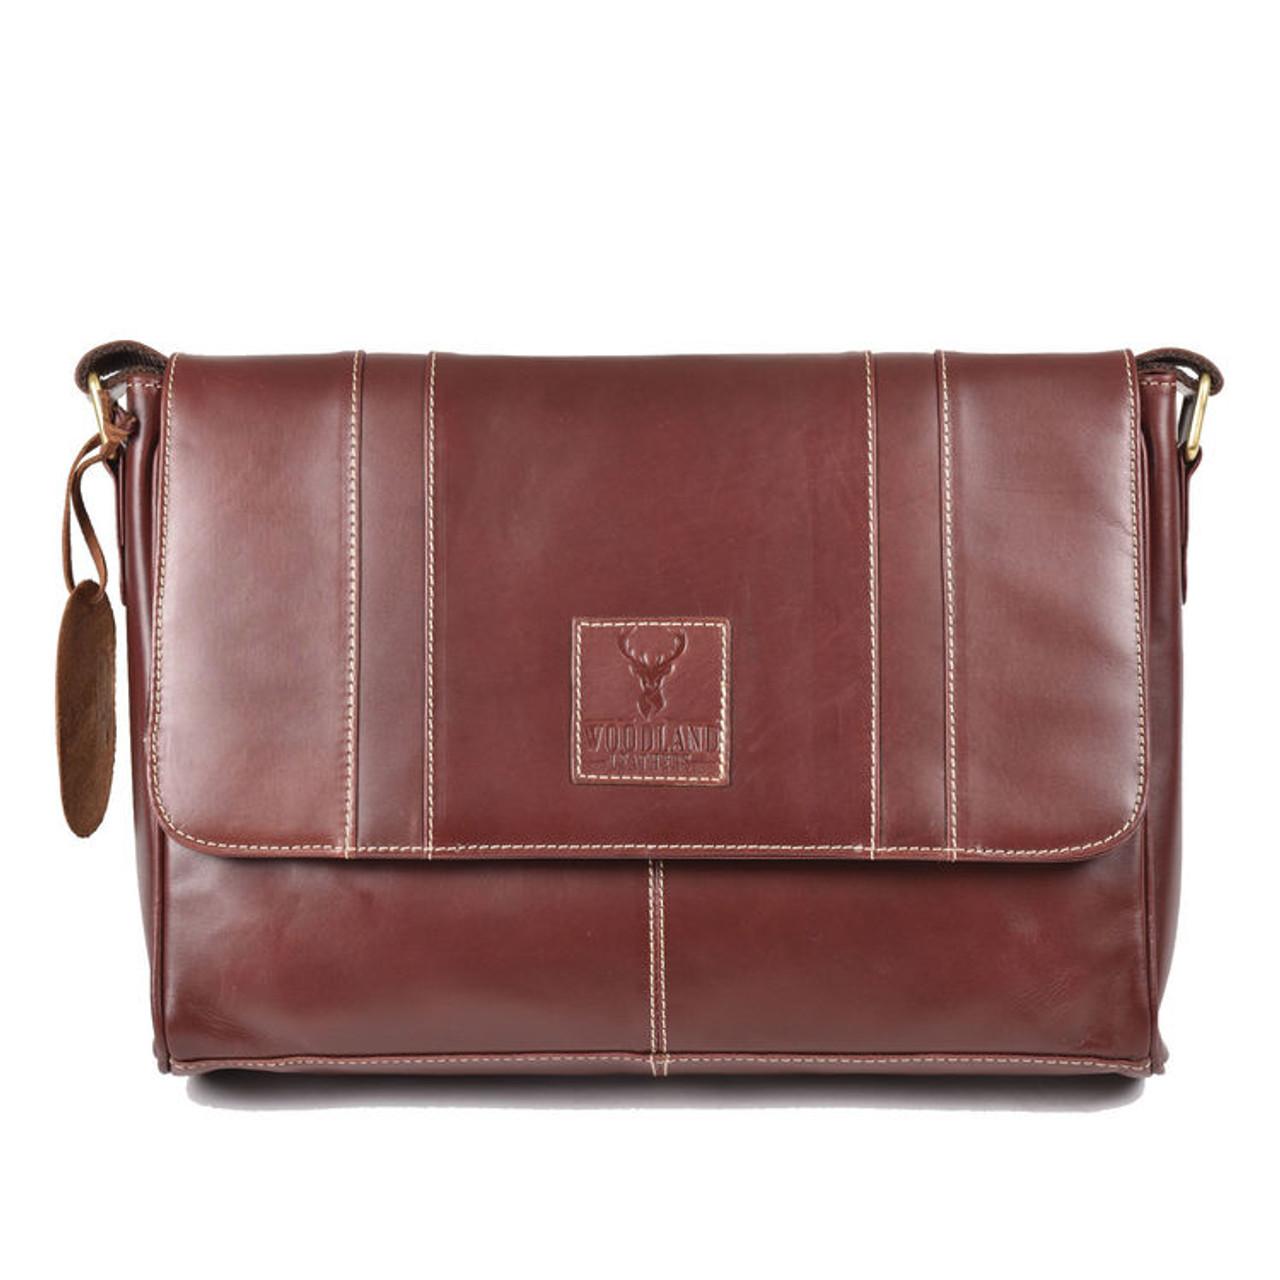 477f546a5a8 Burnish Brown Buffalo Leather Messenger Bag